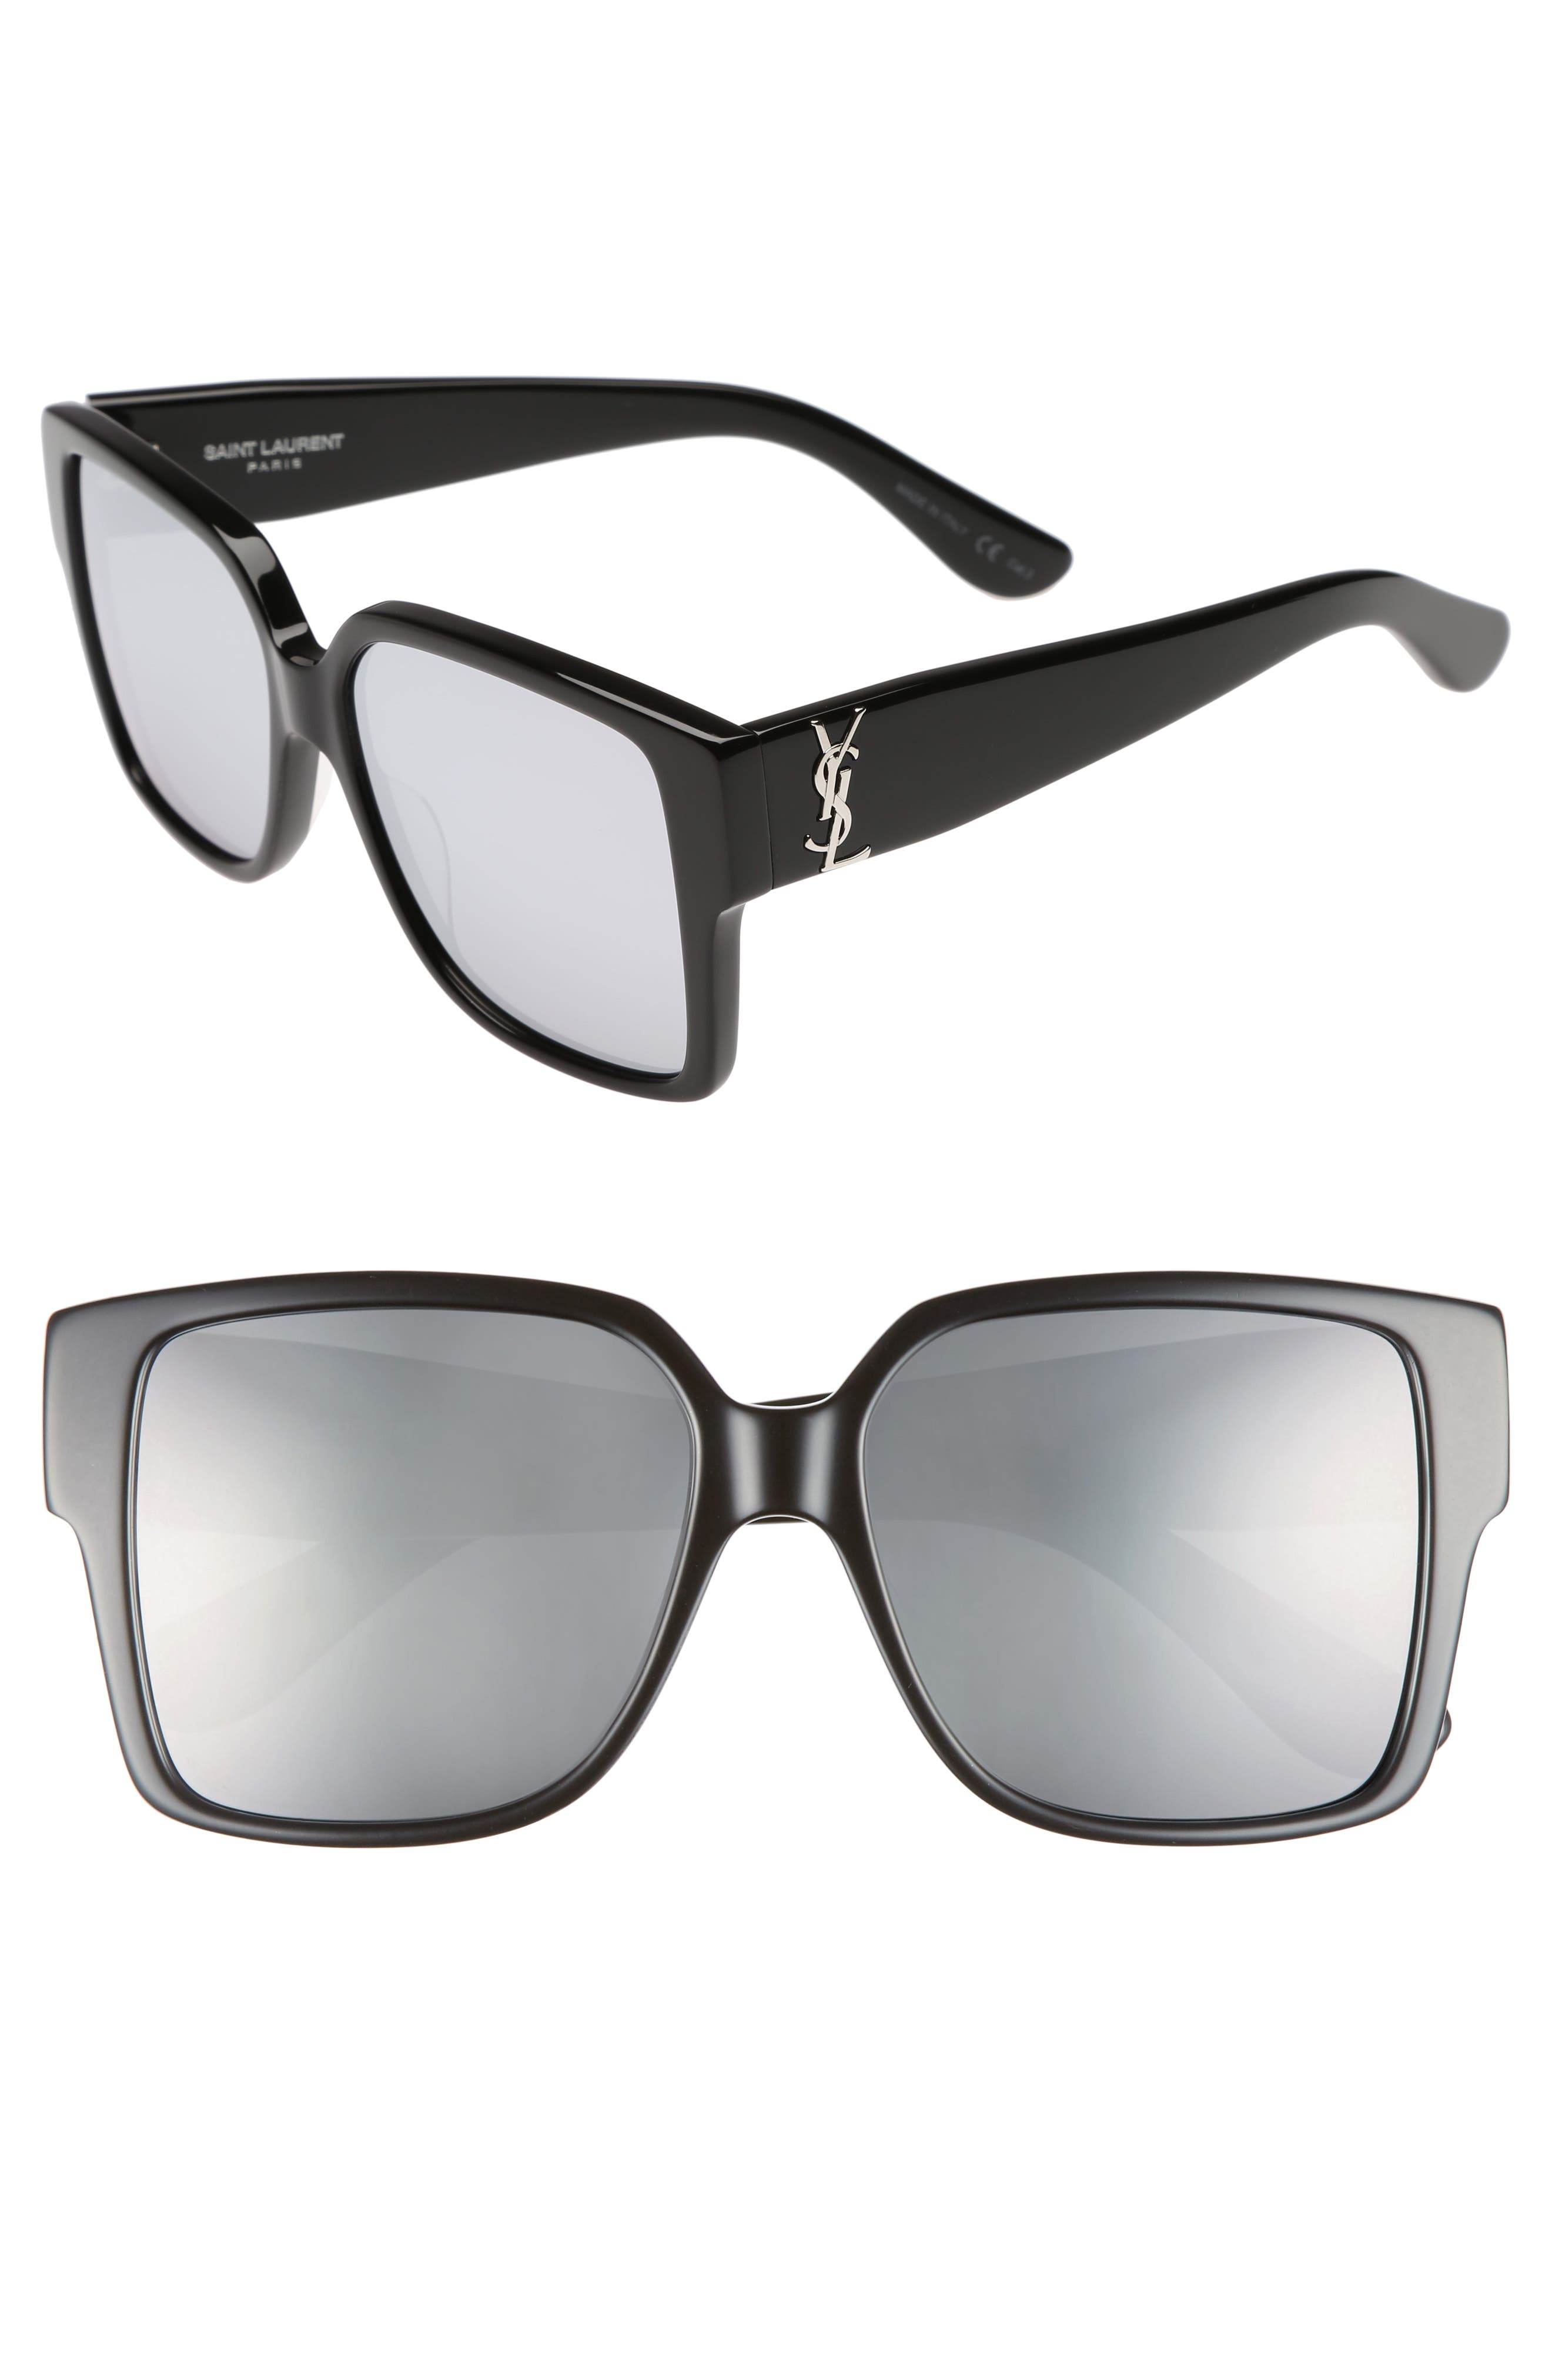 55mm Square Sunglasses,                             Main thumbnail 1, color,                             001